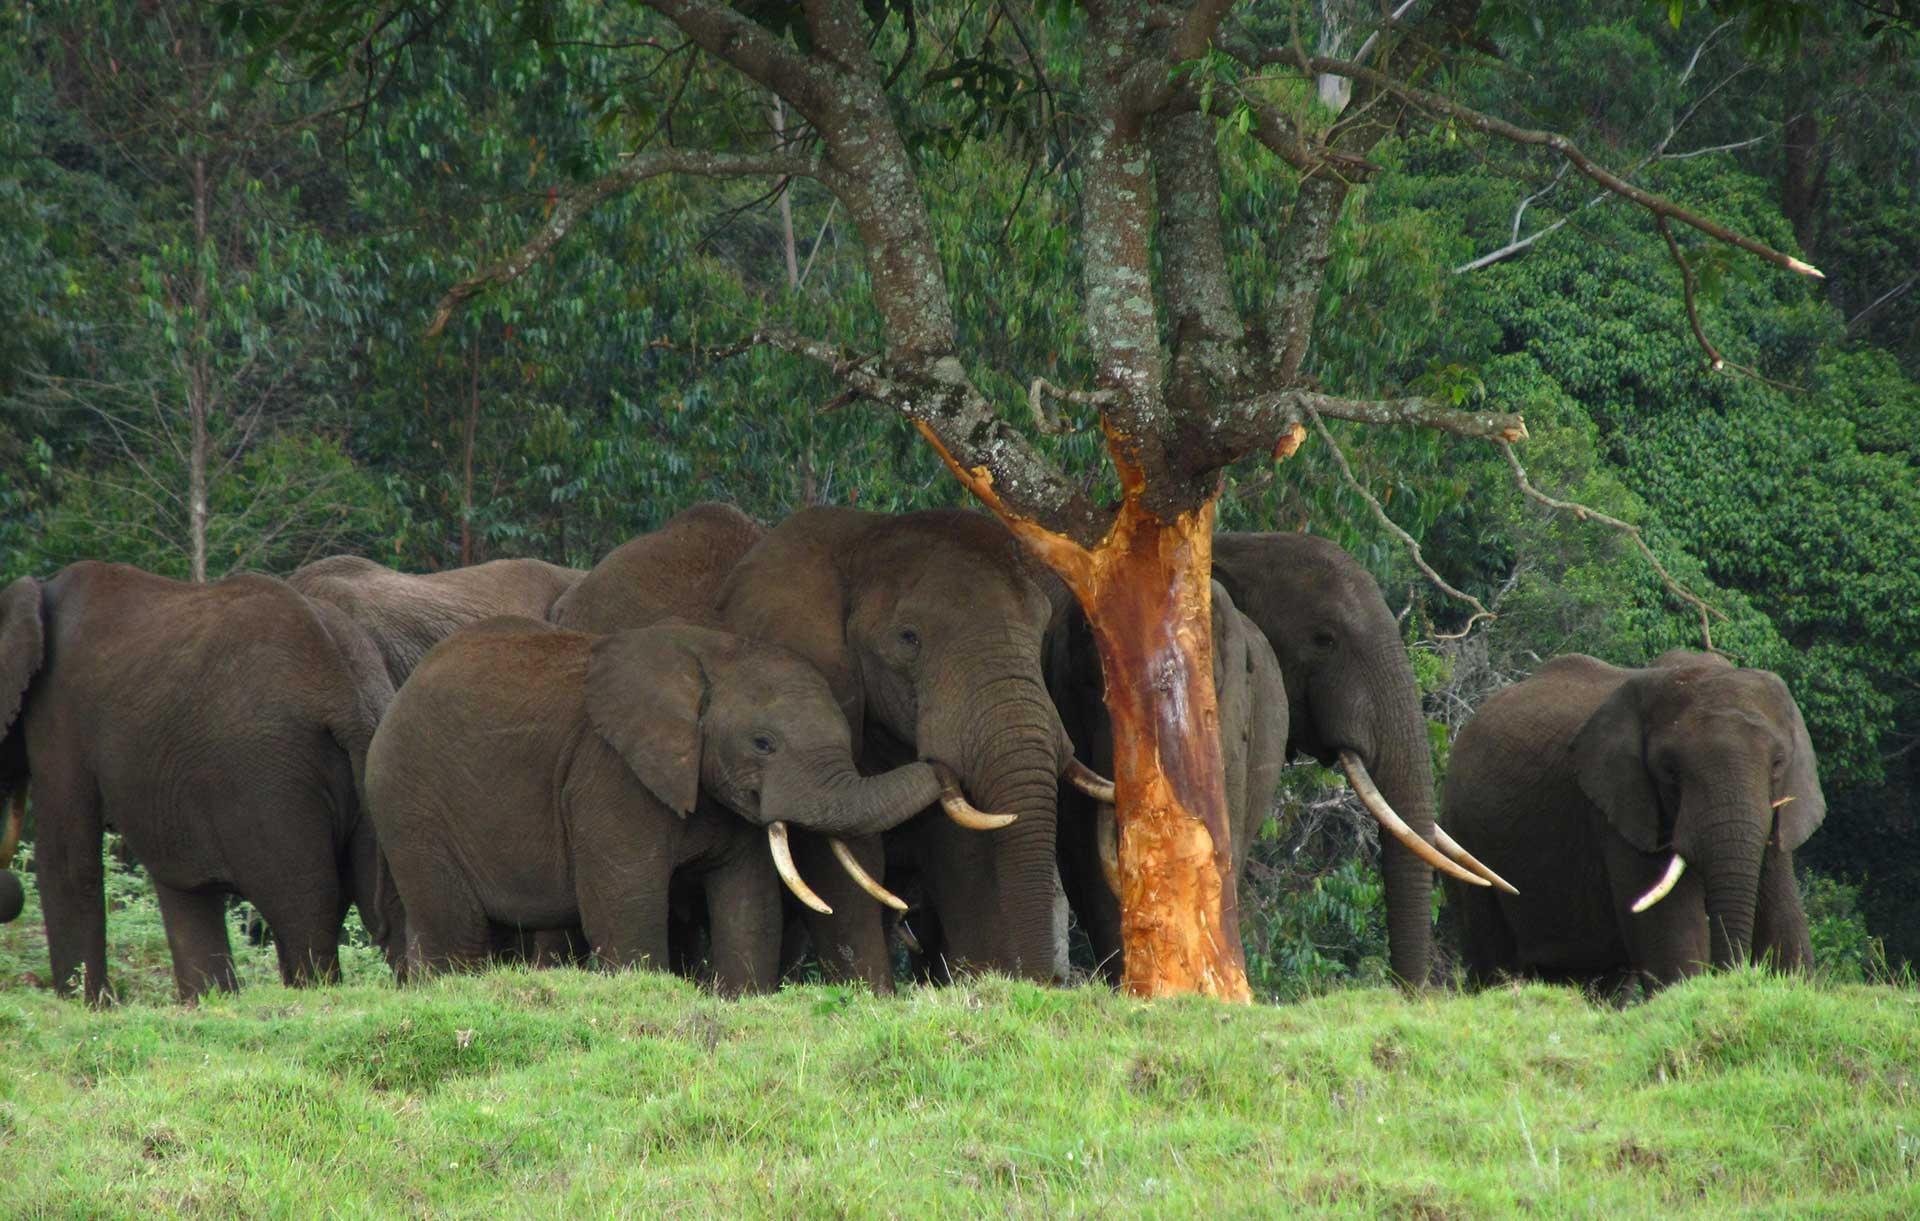 Elephants eating an Avocado Tree